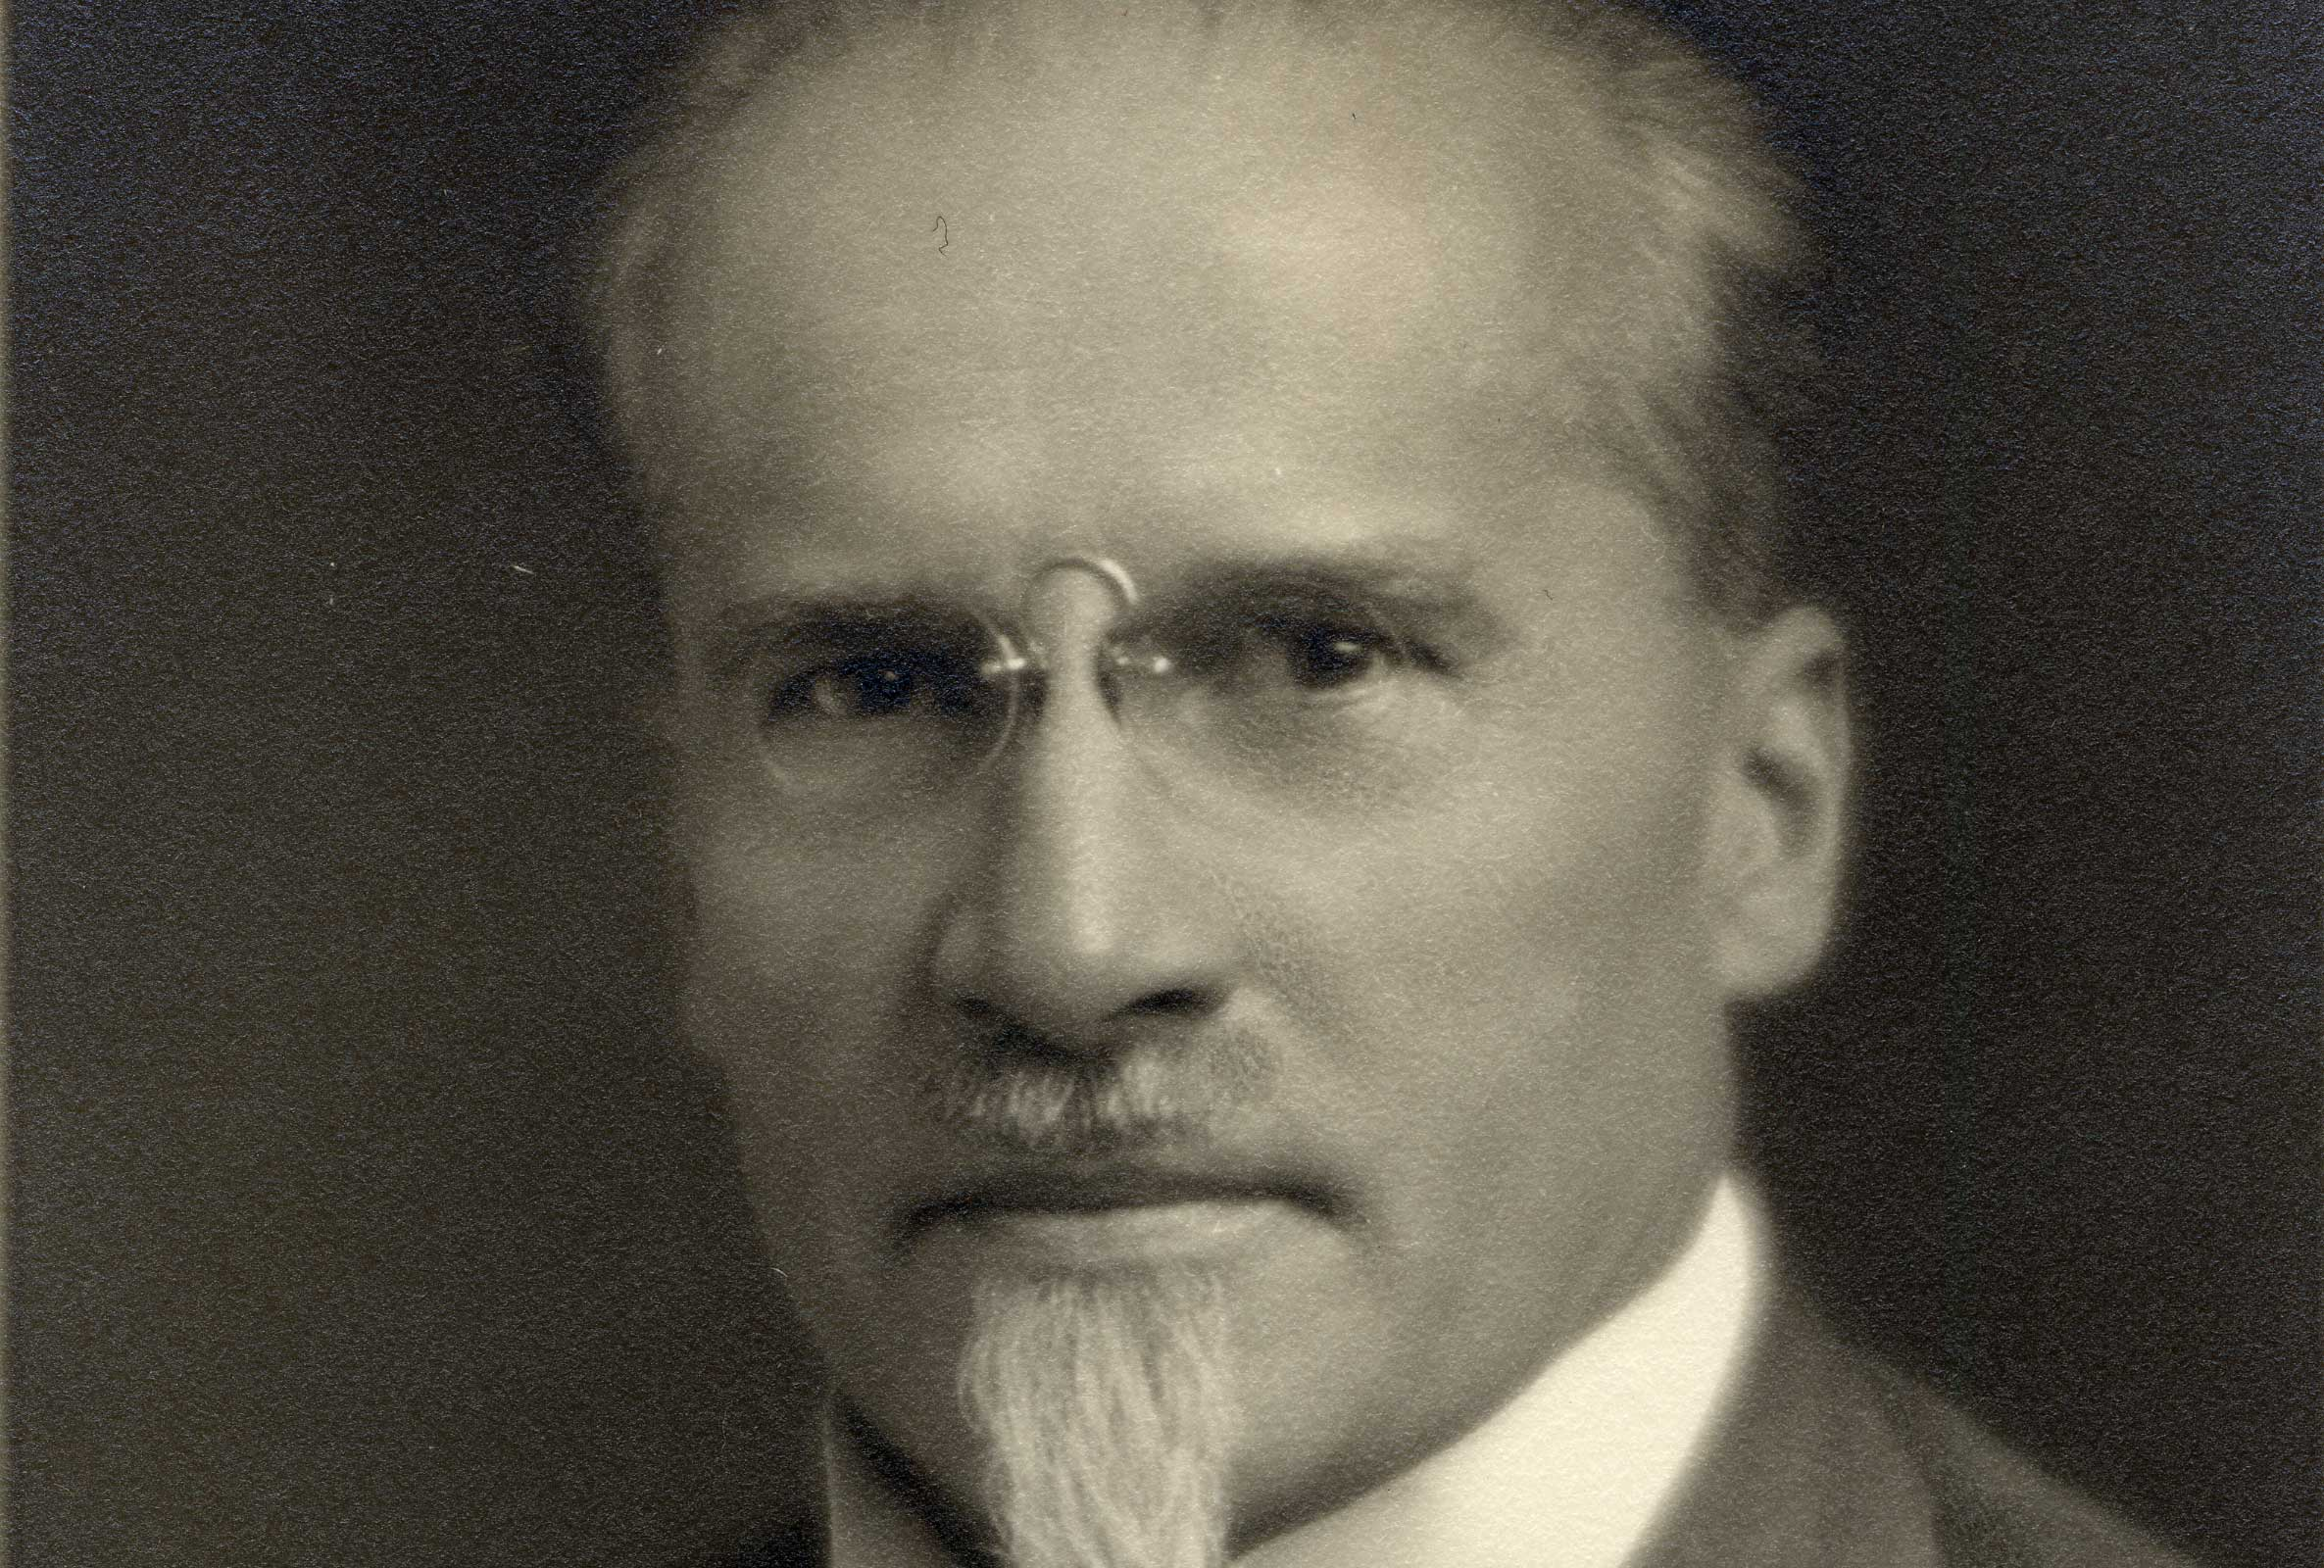 Pawlowski close-up